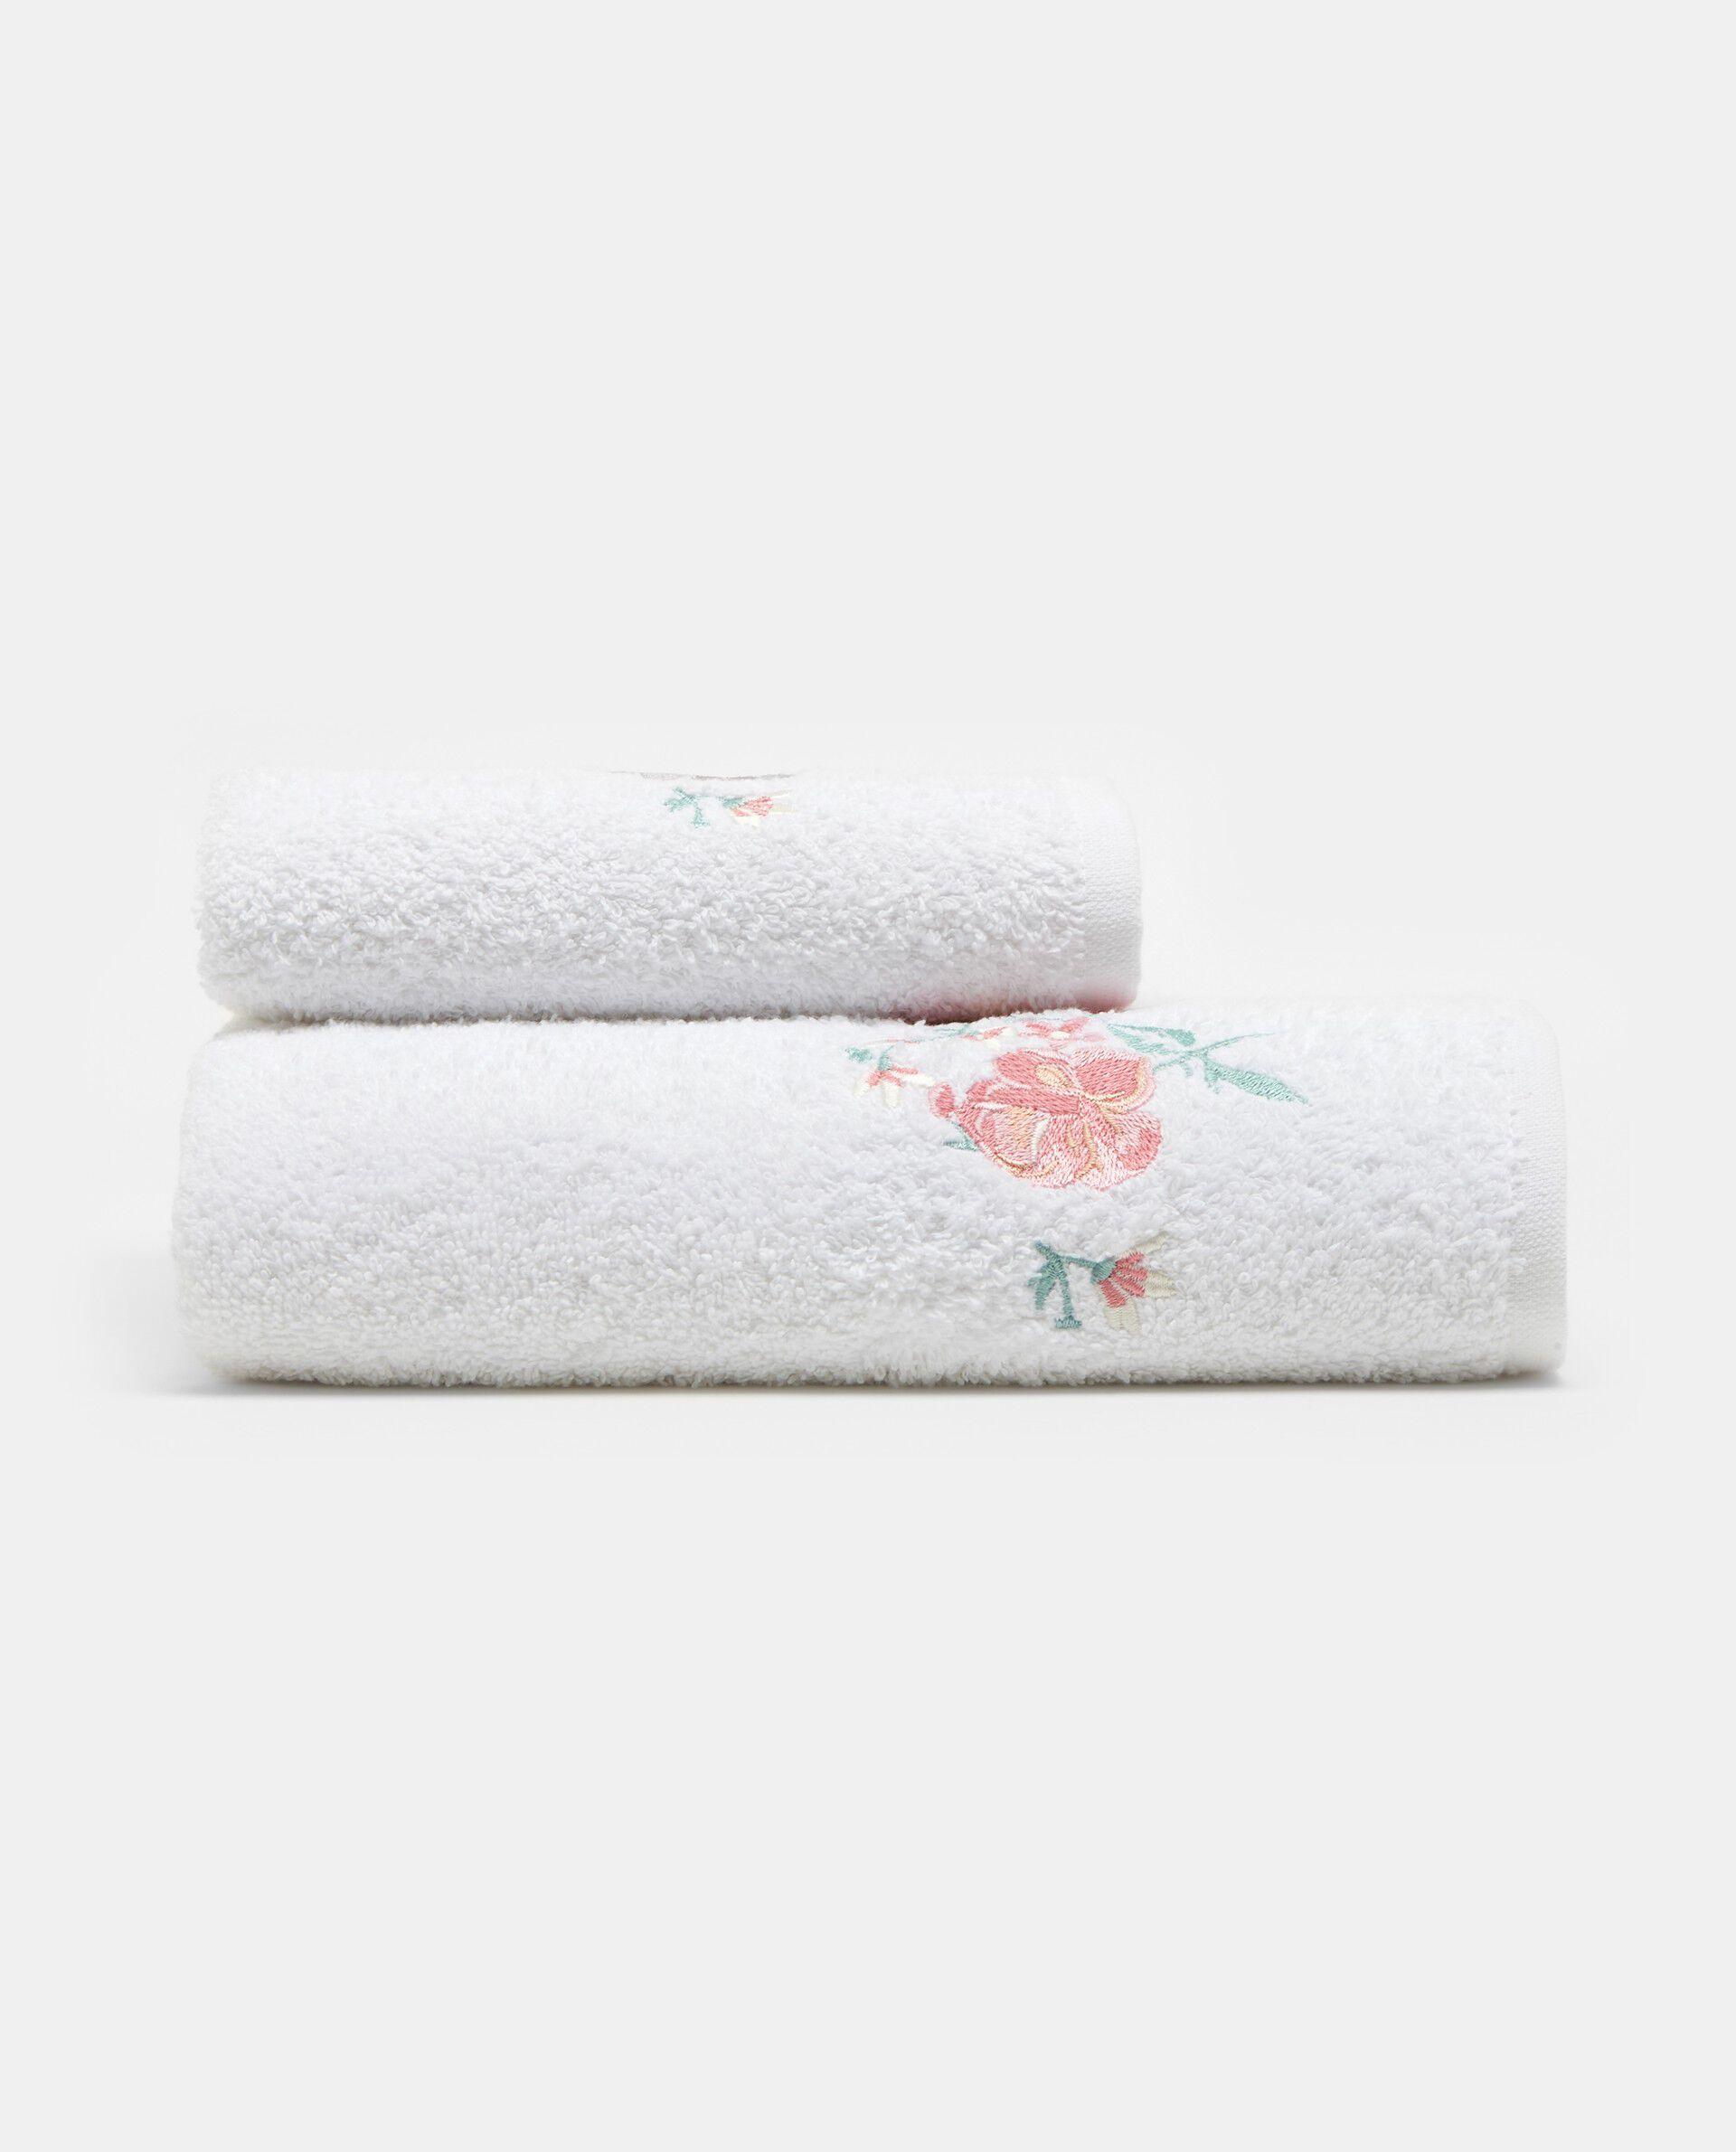 Asciugamano in cotone ricamo rose